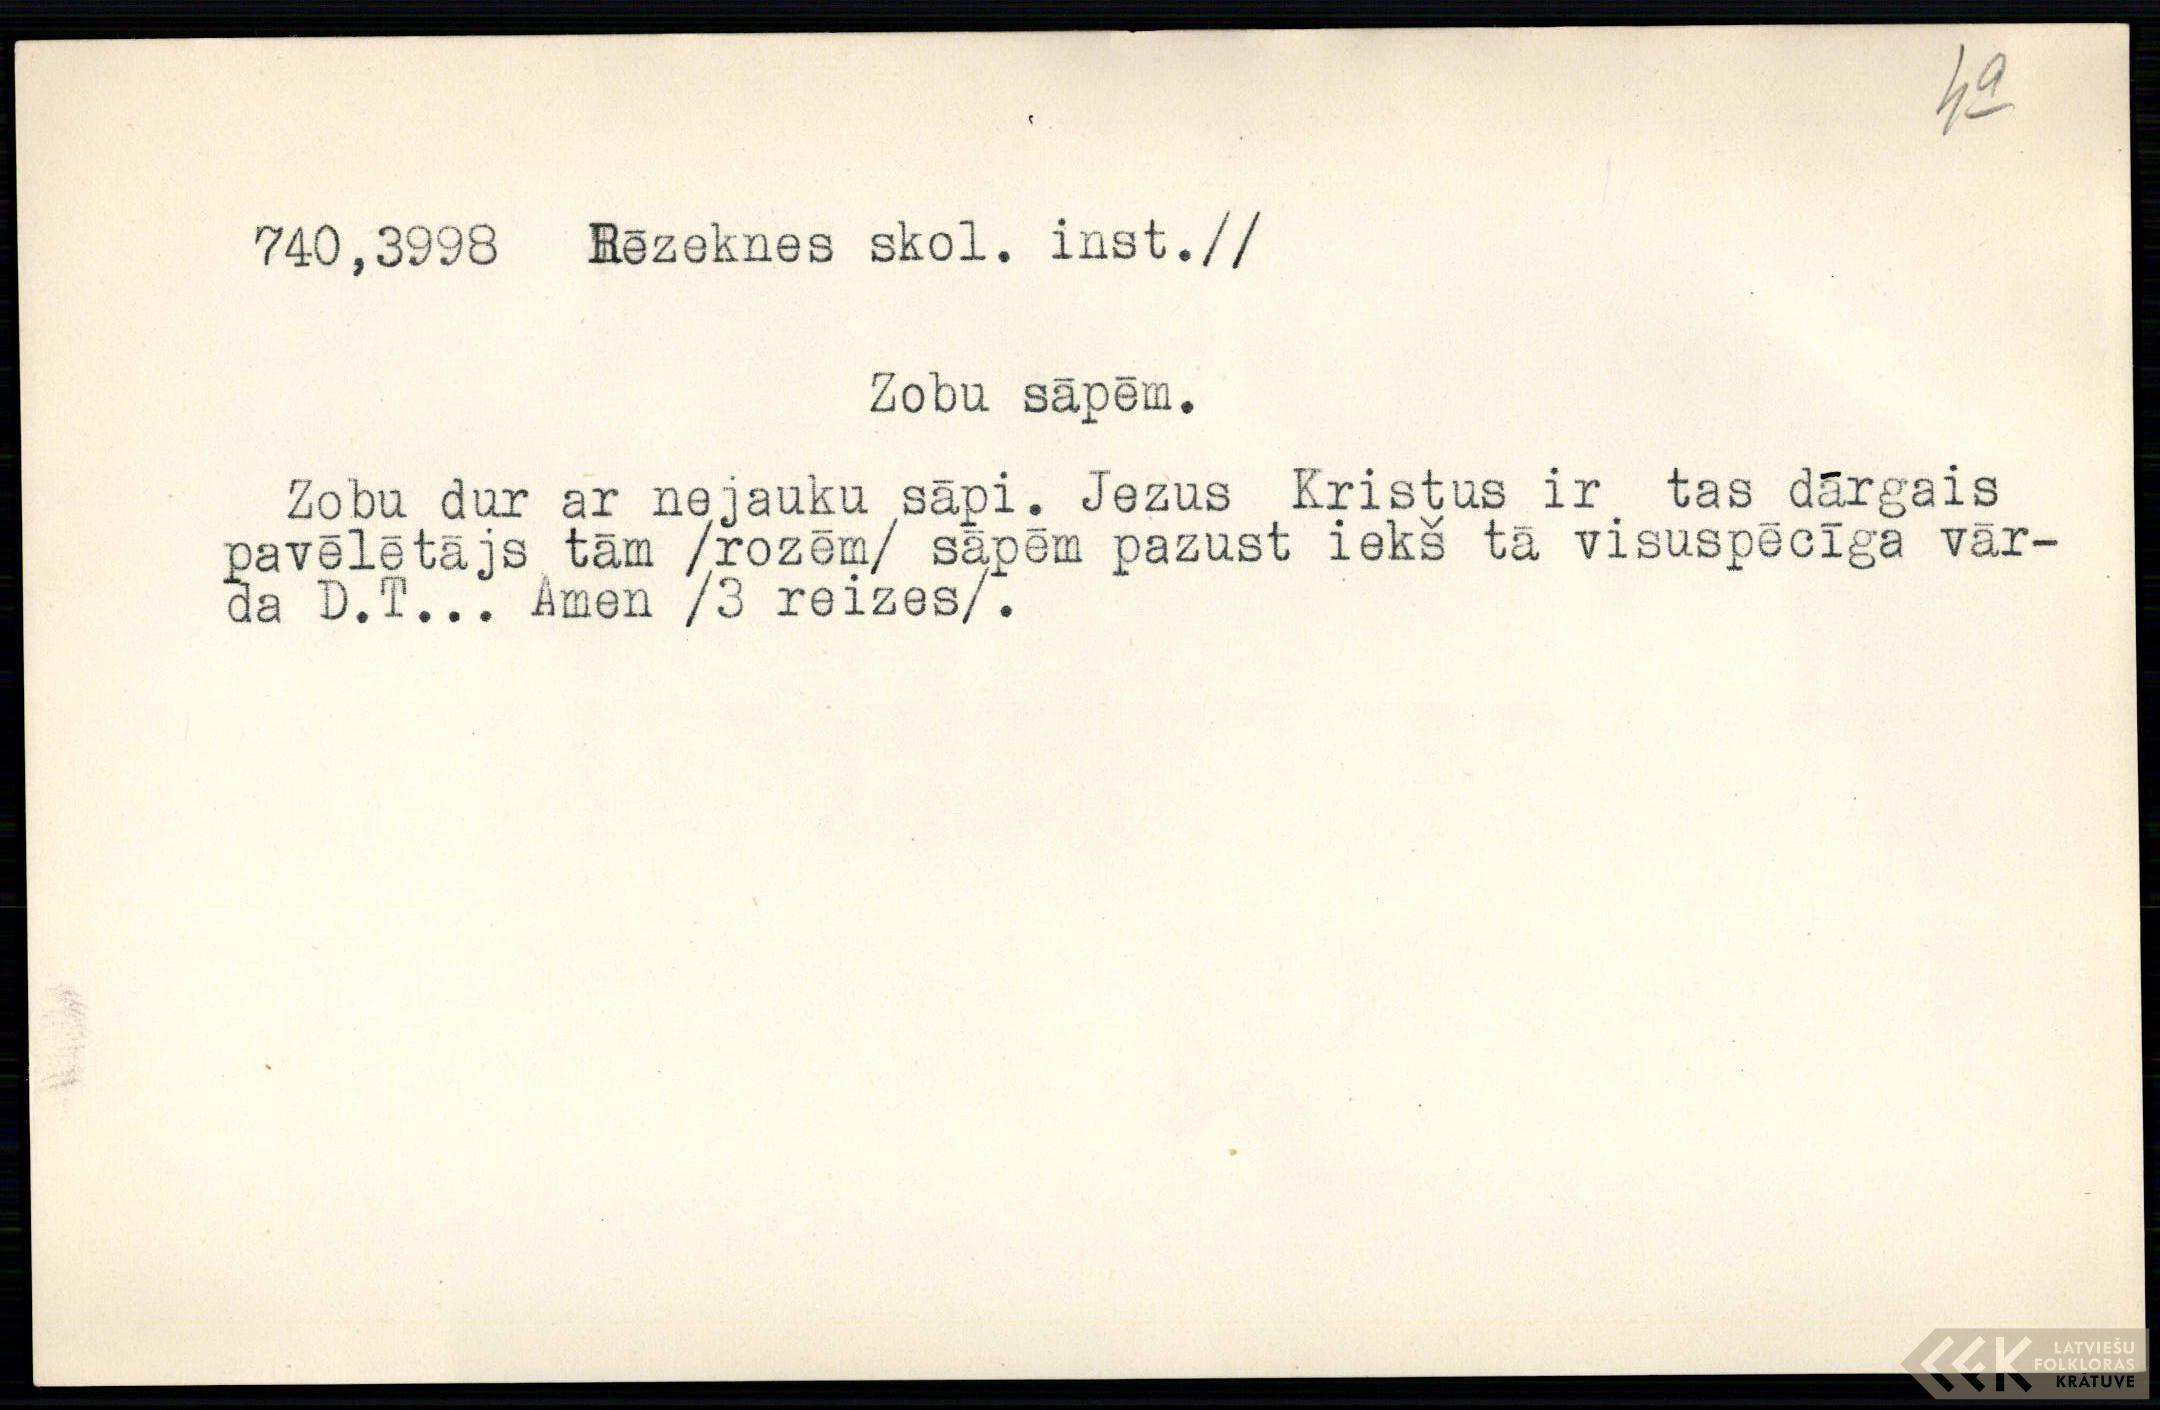 LFK-0740-03998-buramvardu-kartoteka